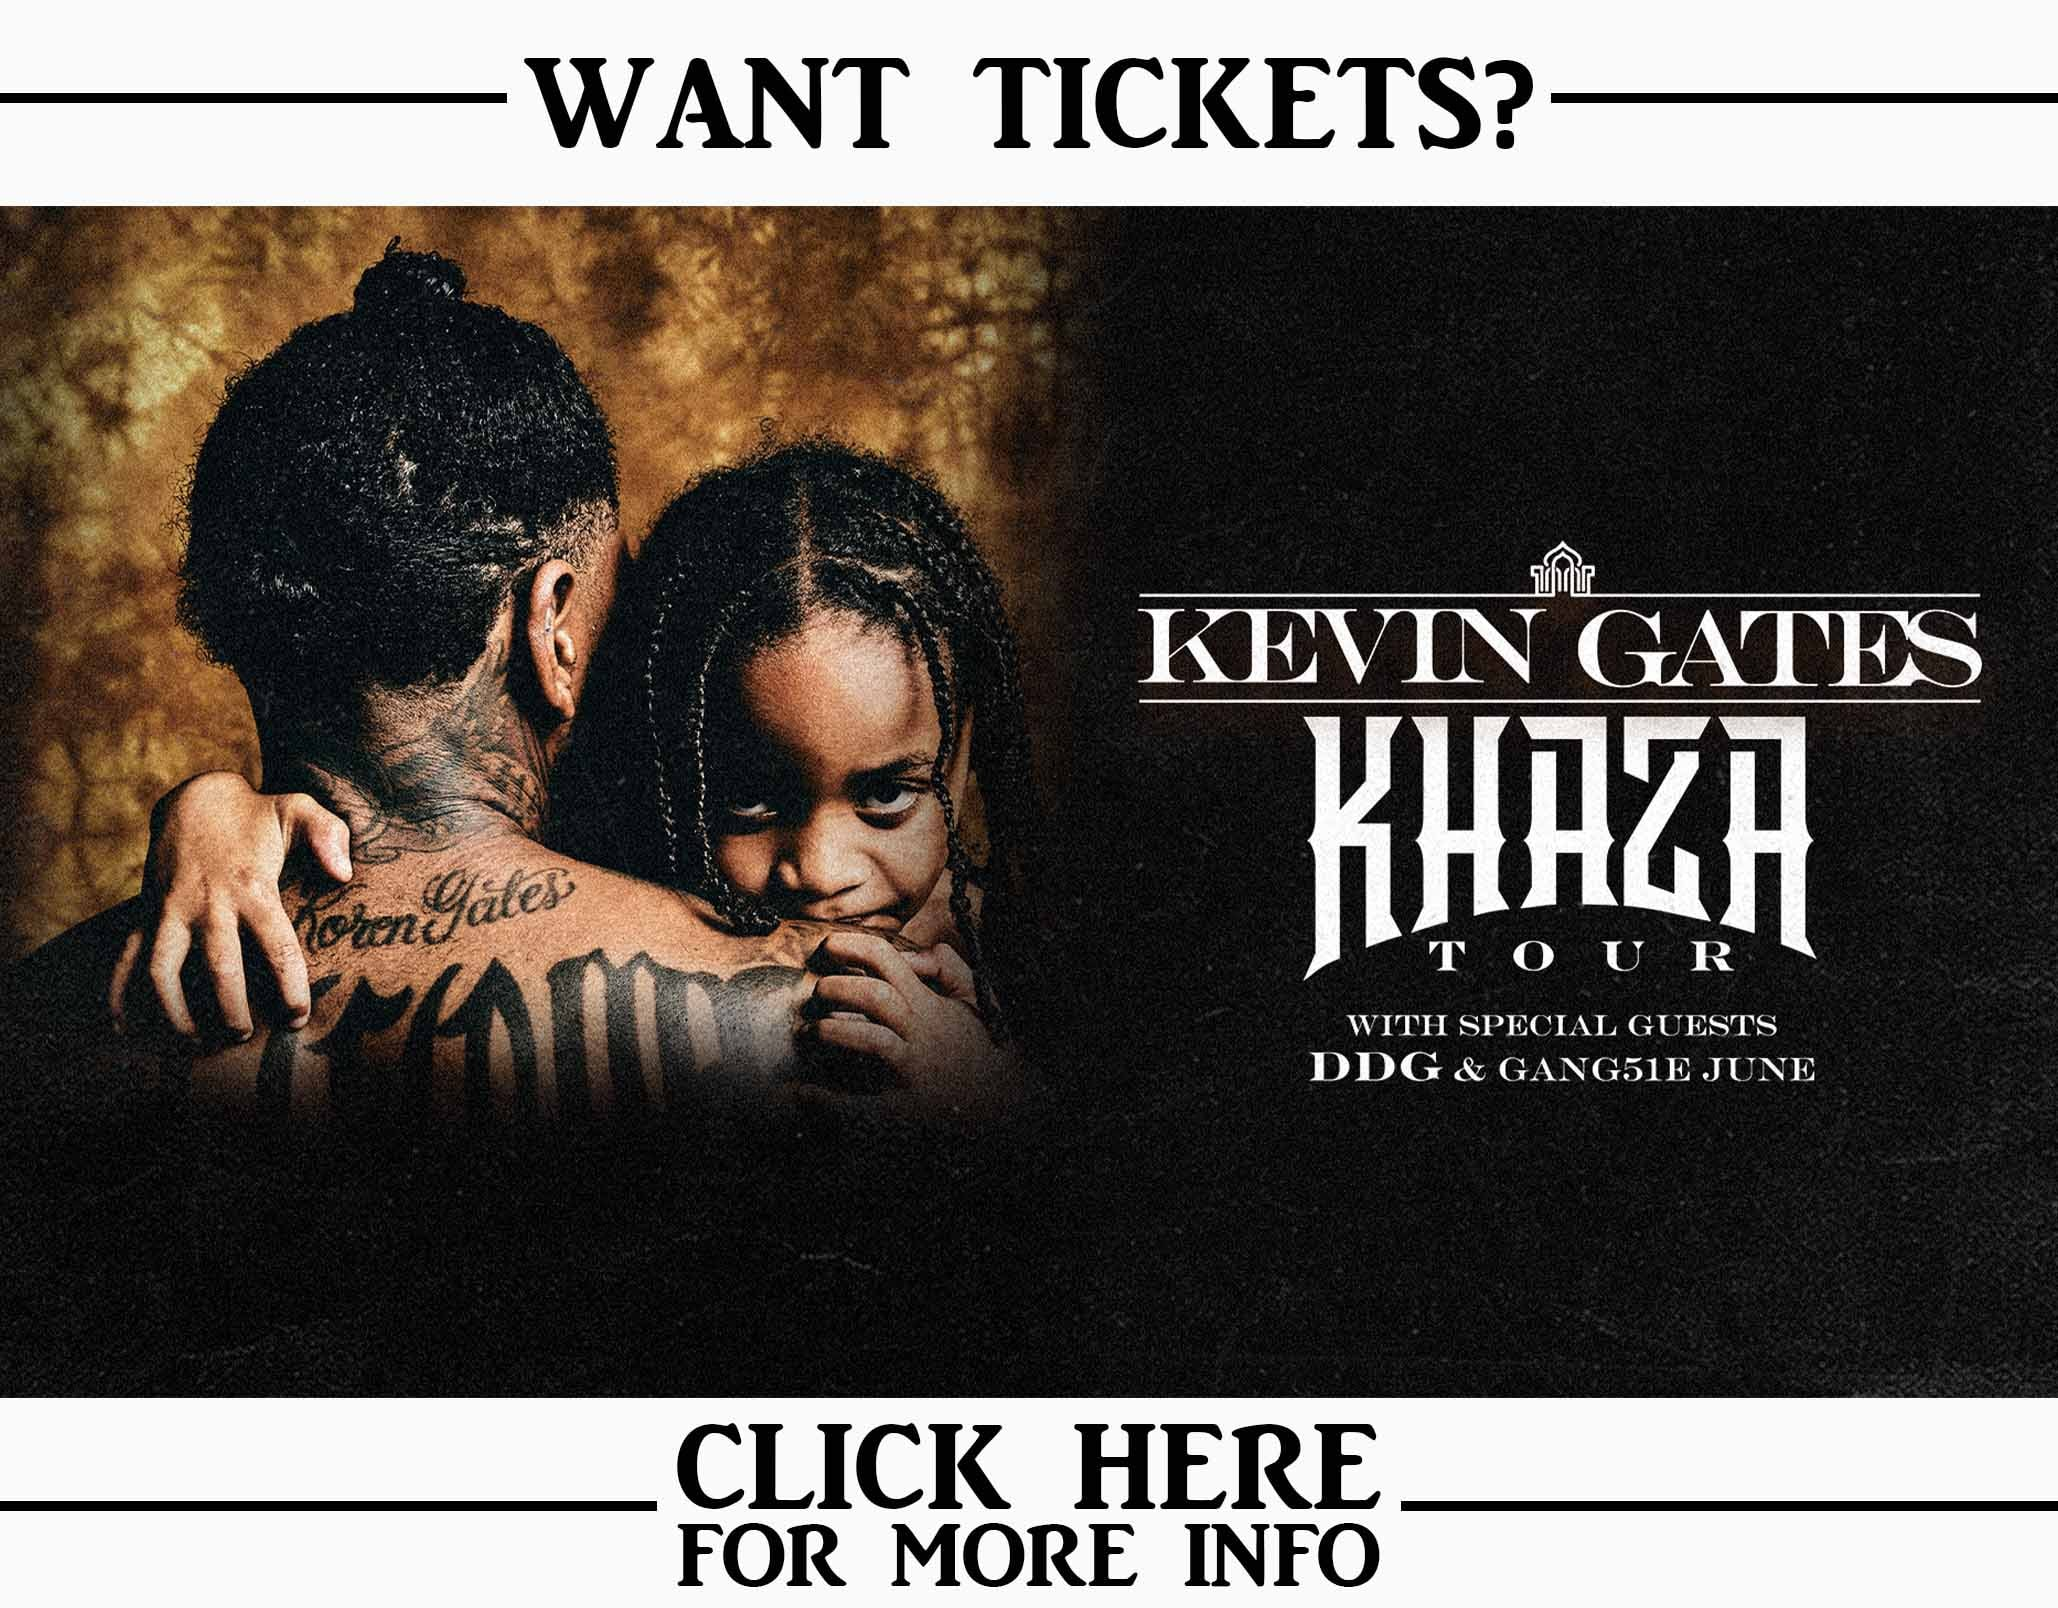 Win Kevin Gates Khaza Tour Tickets!